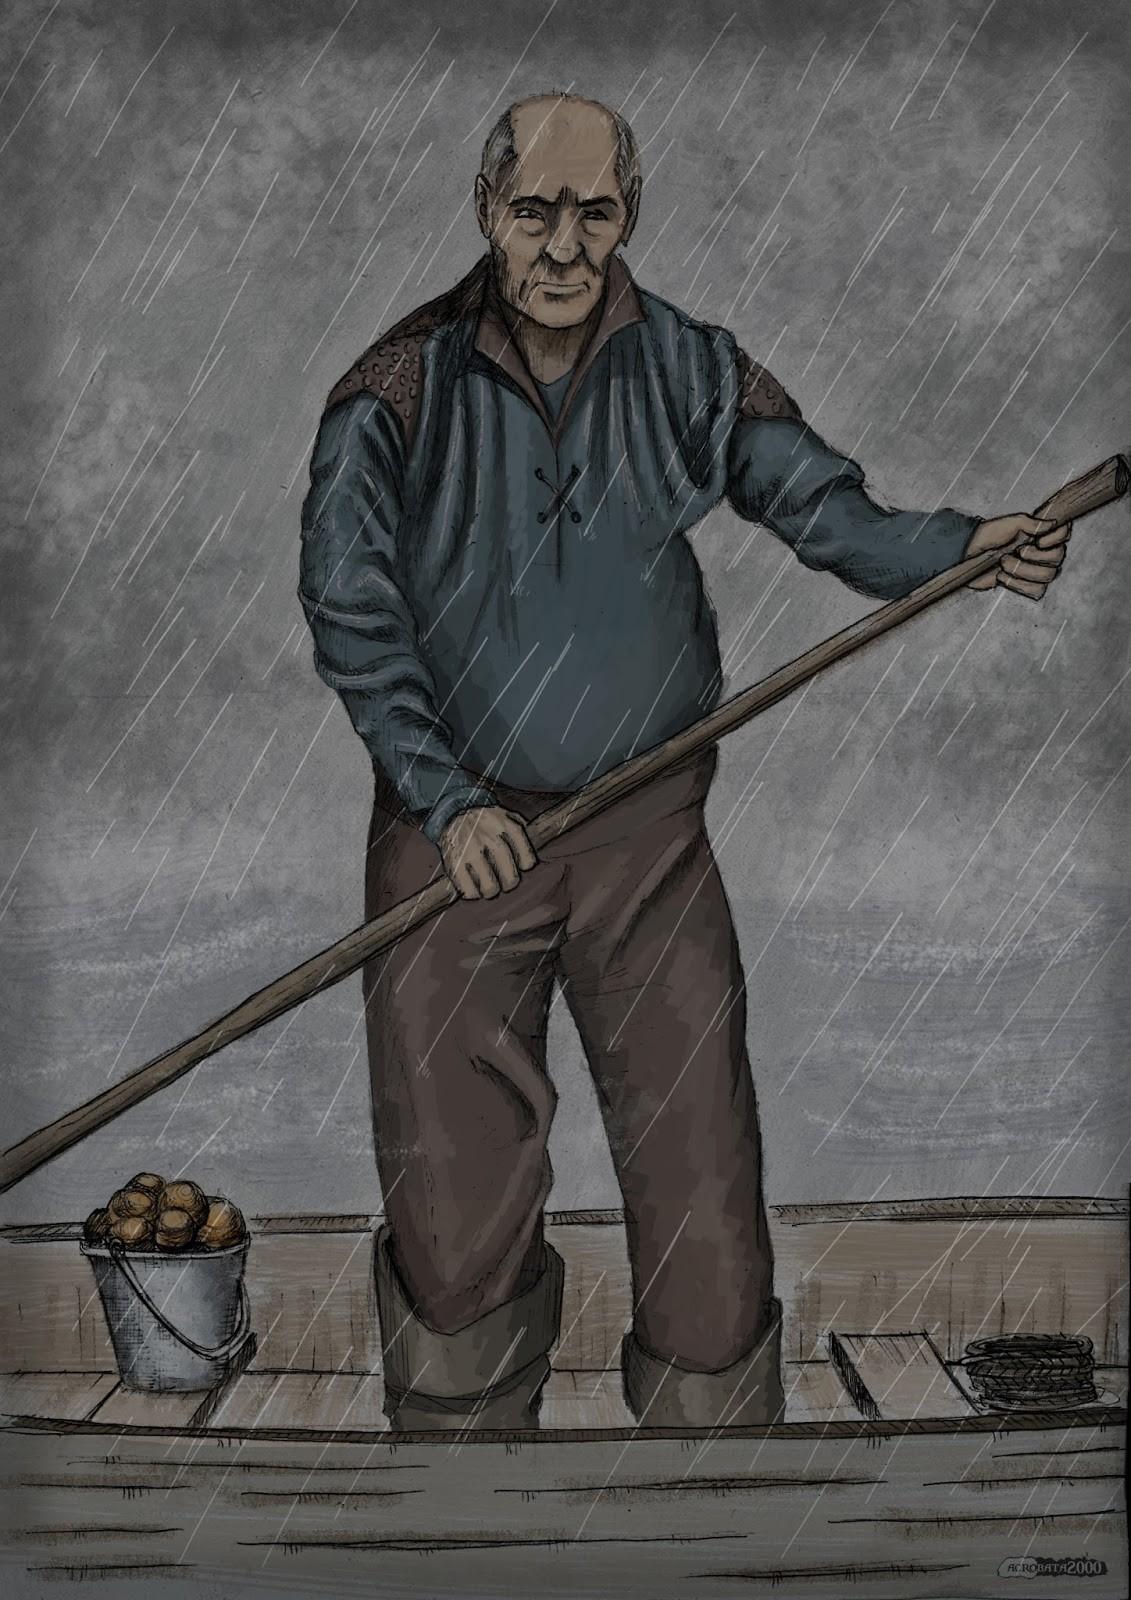 Daniel menendez barquero